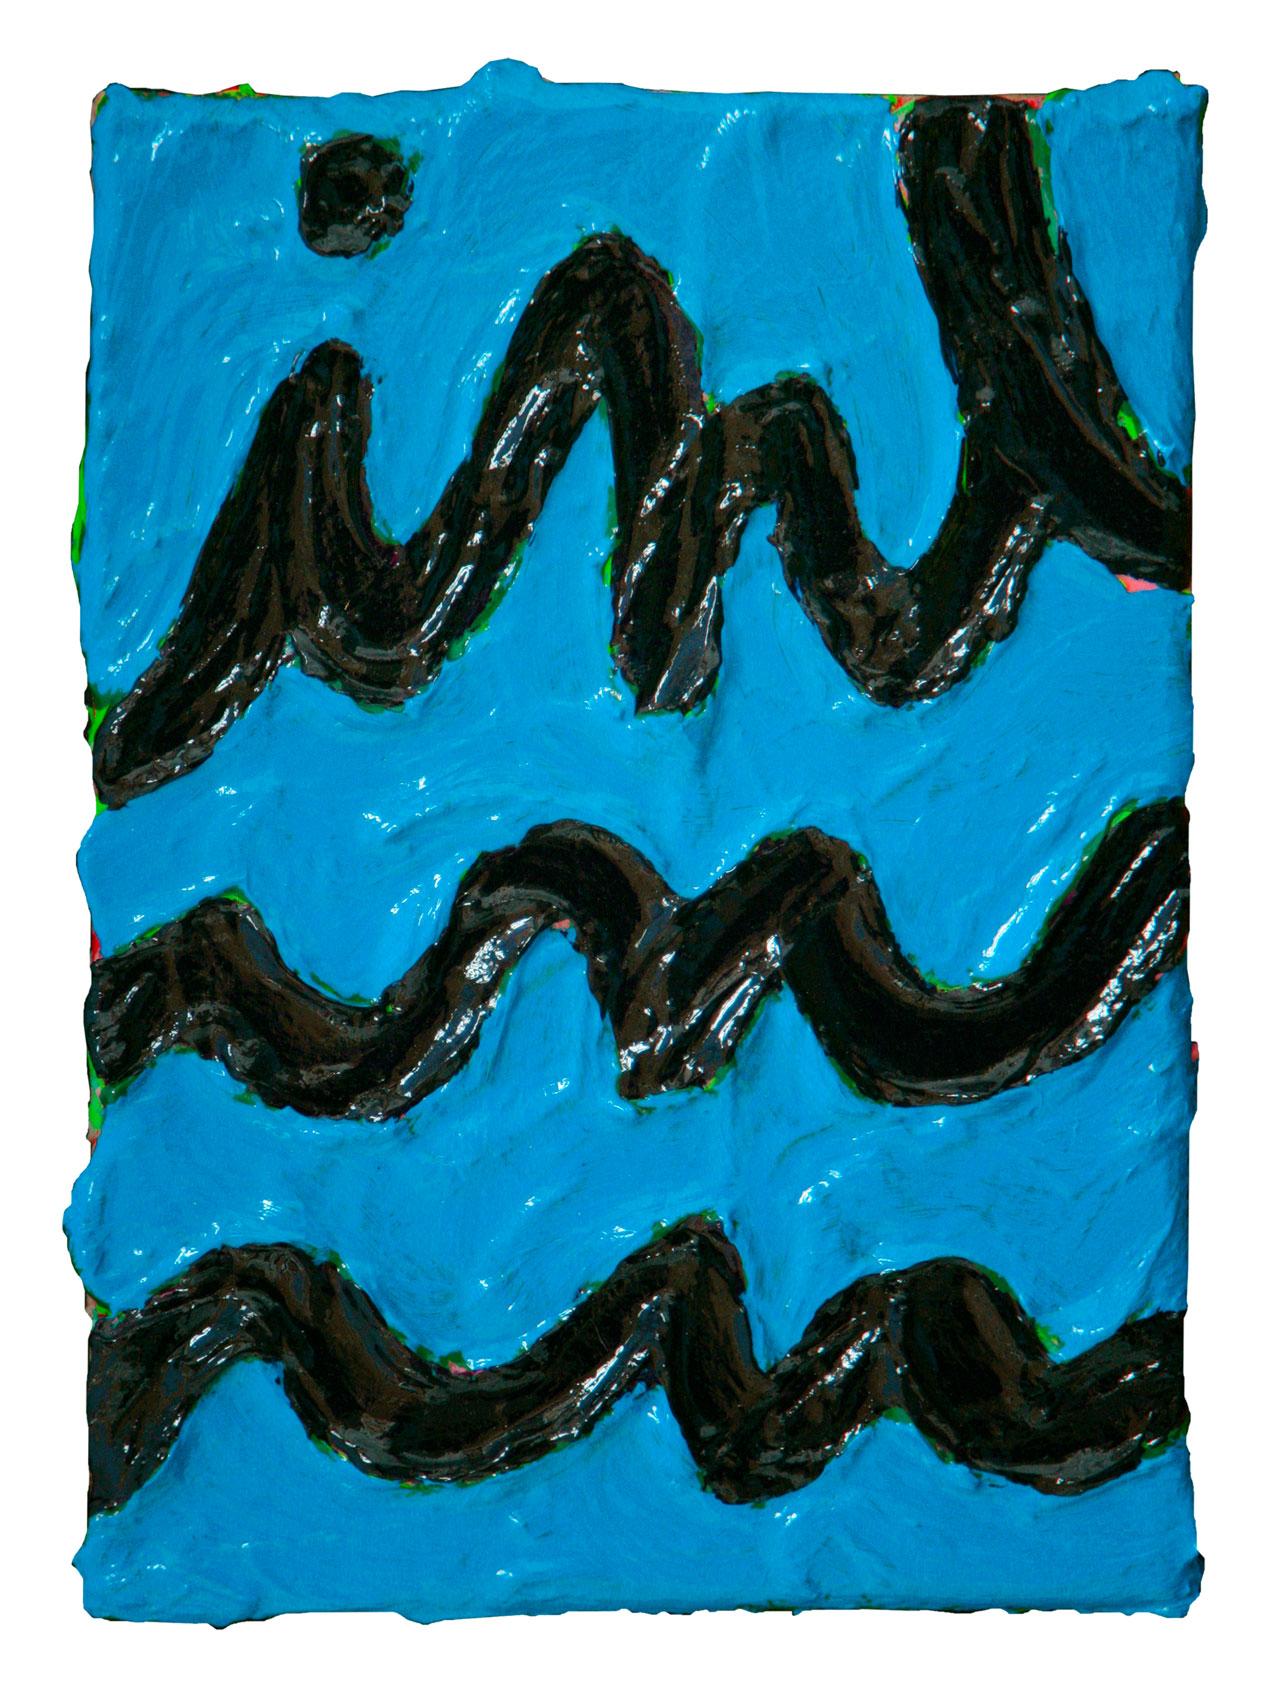 BLUE NOTES | 2010 © Kerstin Jeckel | MEMORY-PROJEKT #103